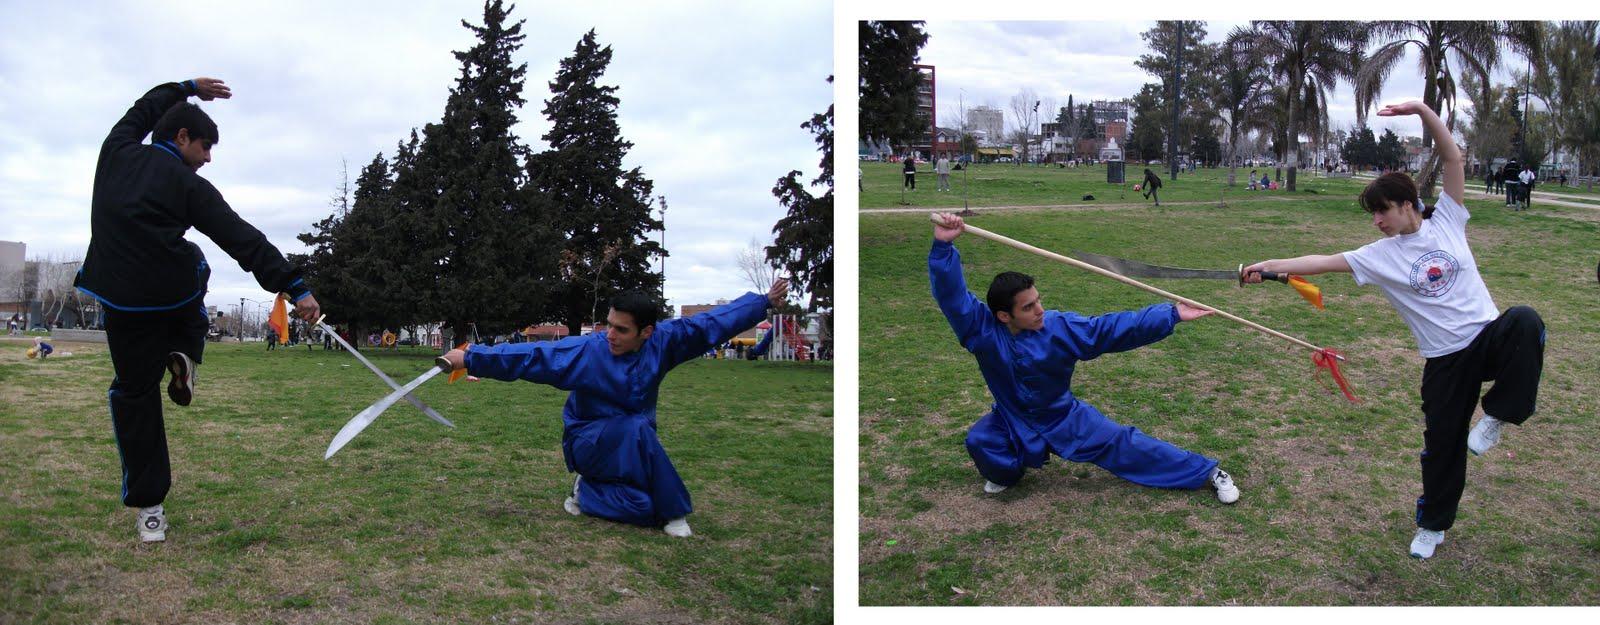 Karate: golpes circulares, uchi waza Parque+alverti+2011+133